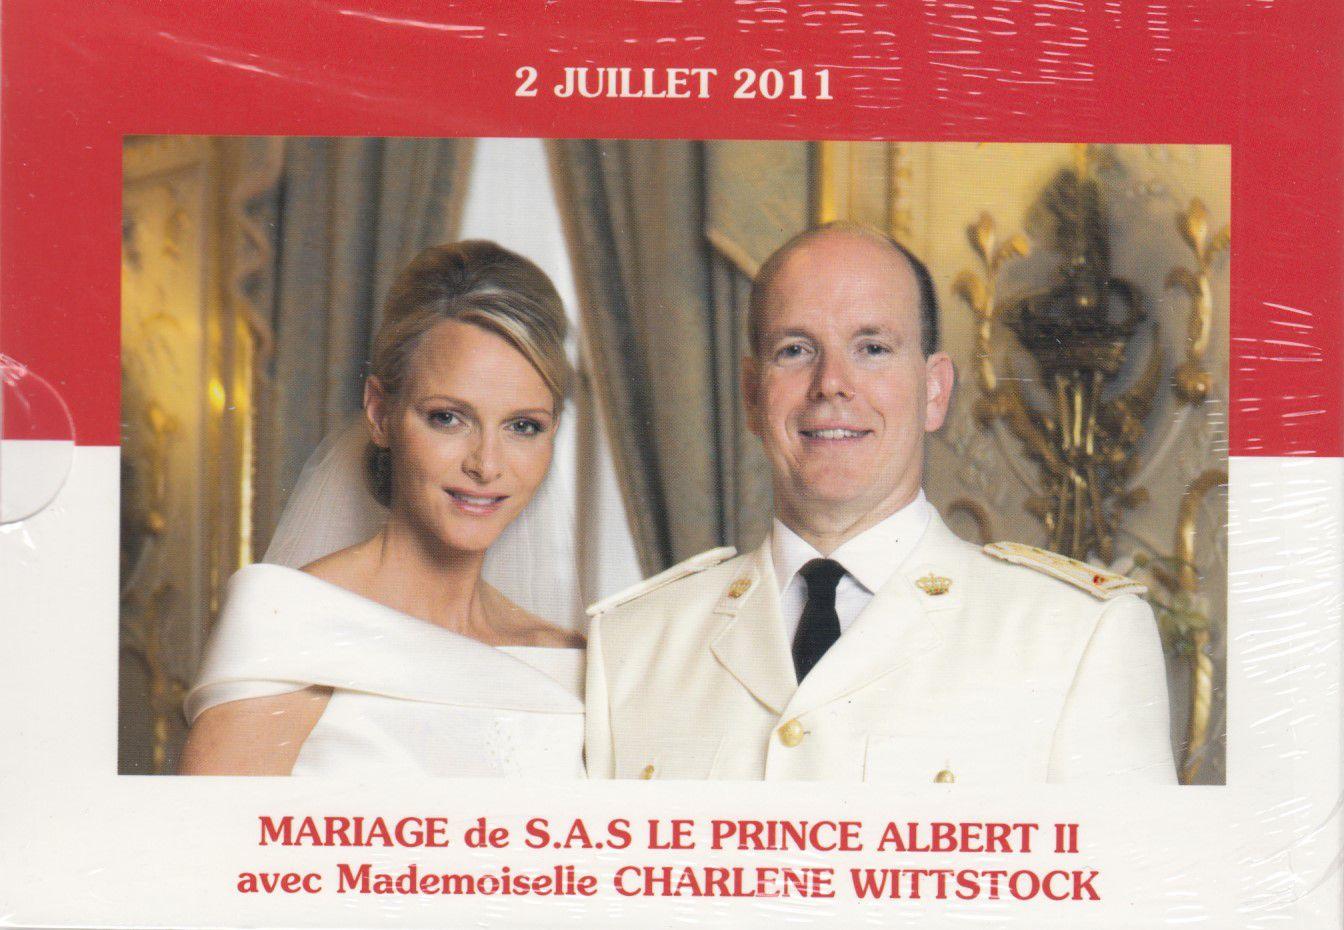 Monaco Set BU Euro - Monaco 9 coins - 2011 - Wedding